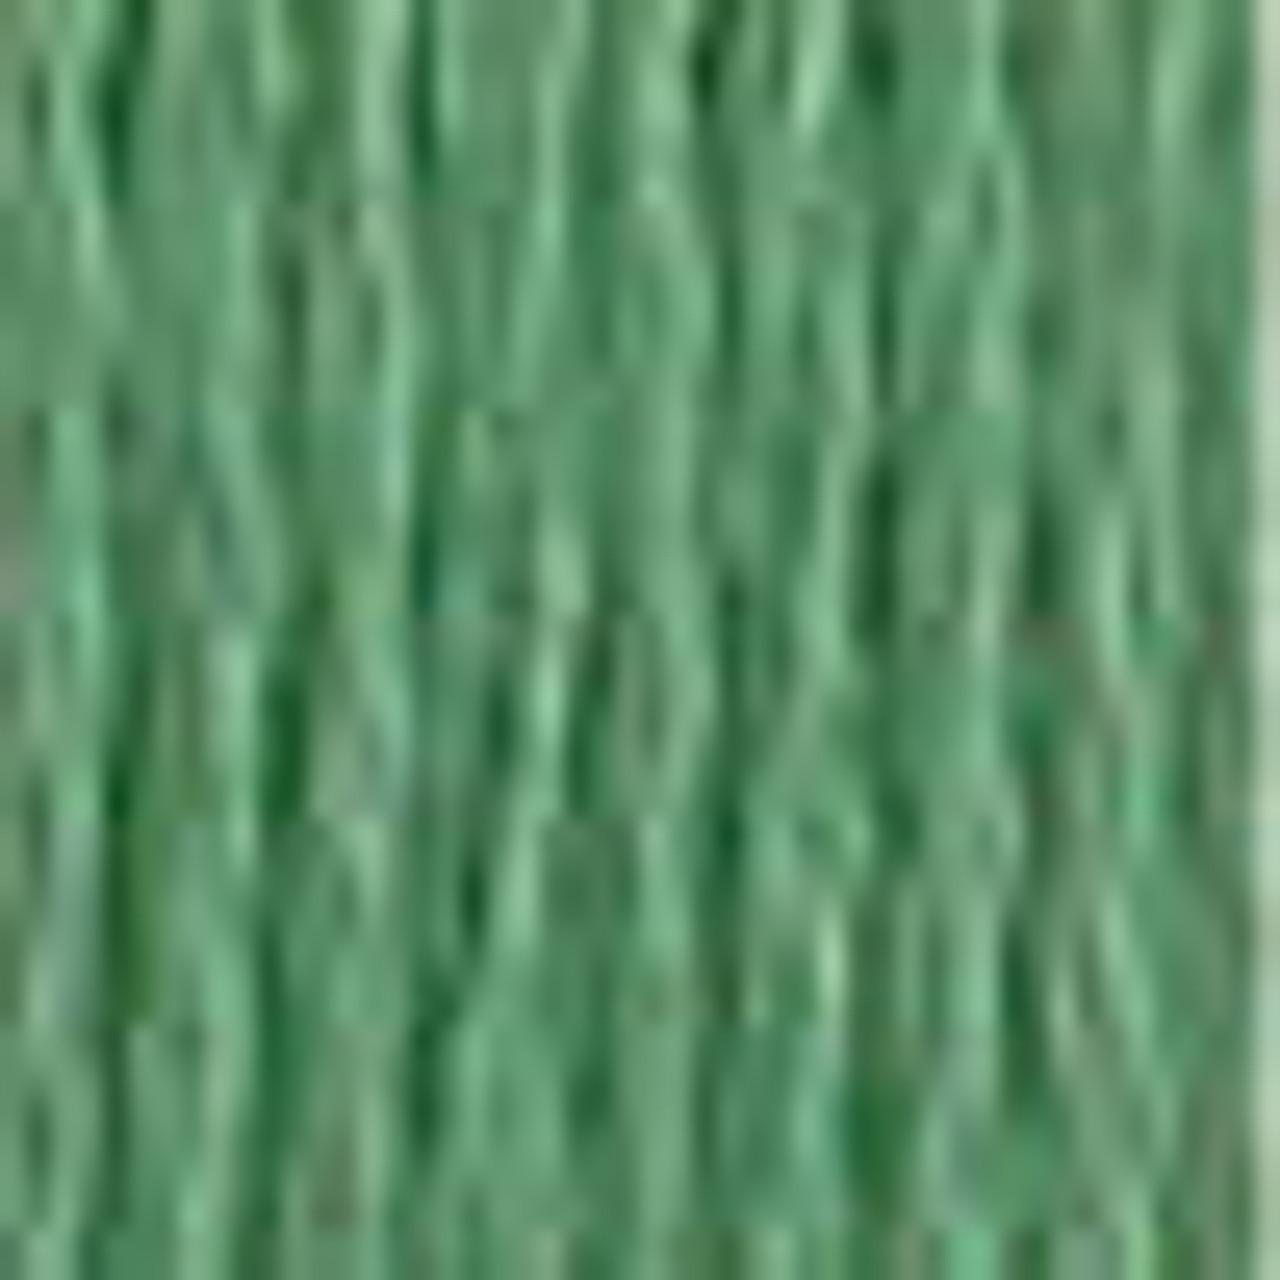 DMC # 320 Medium Pistachio Green  Floss / Thread